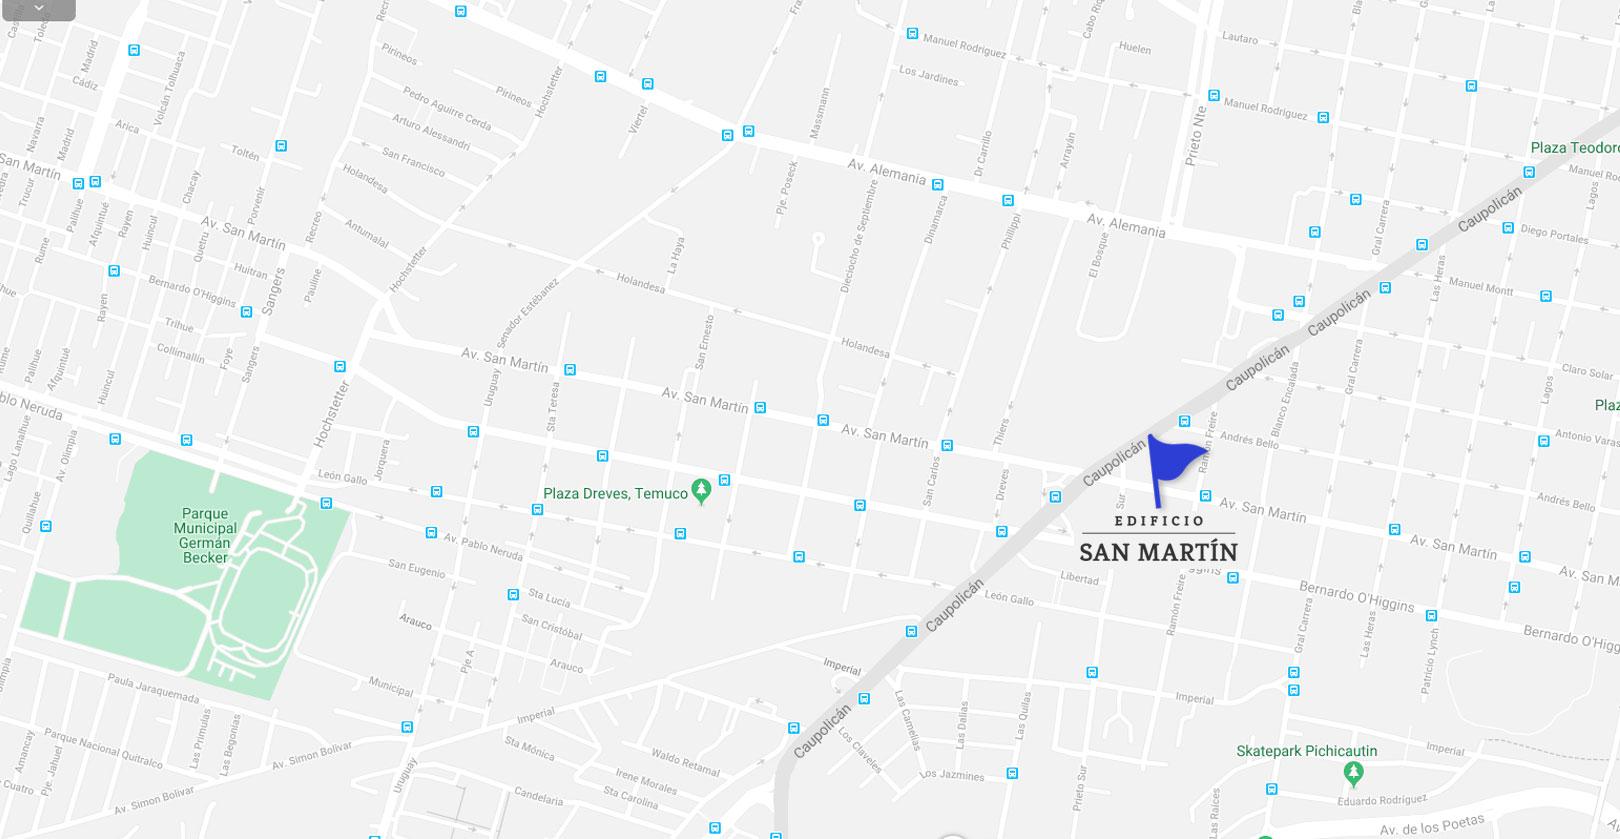 Mapa-edificio san martin-Dubois